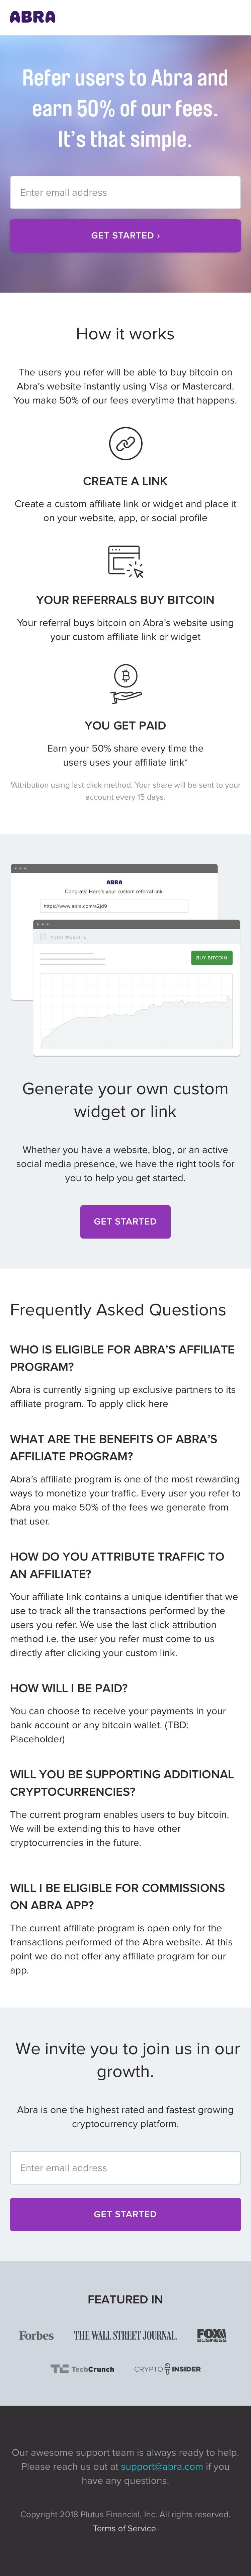 affiliates-03-mobile.jpg